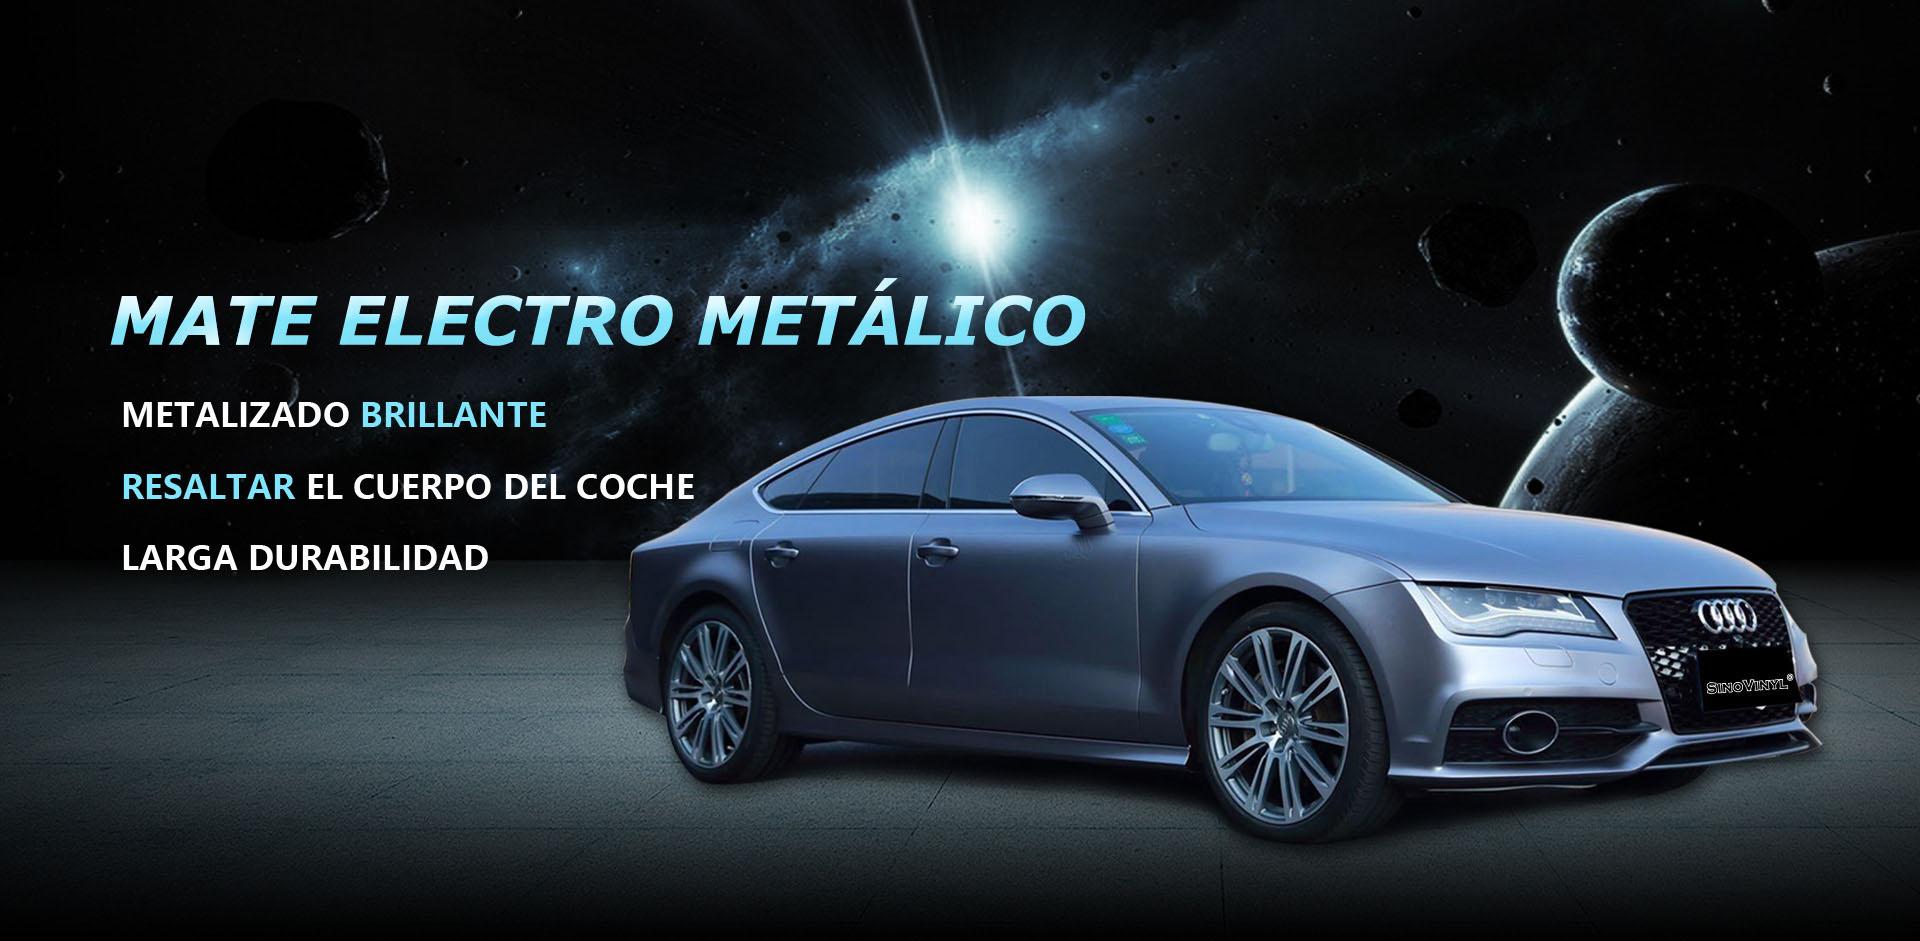 Vinilo electro metalico